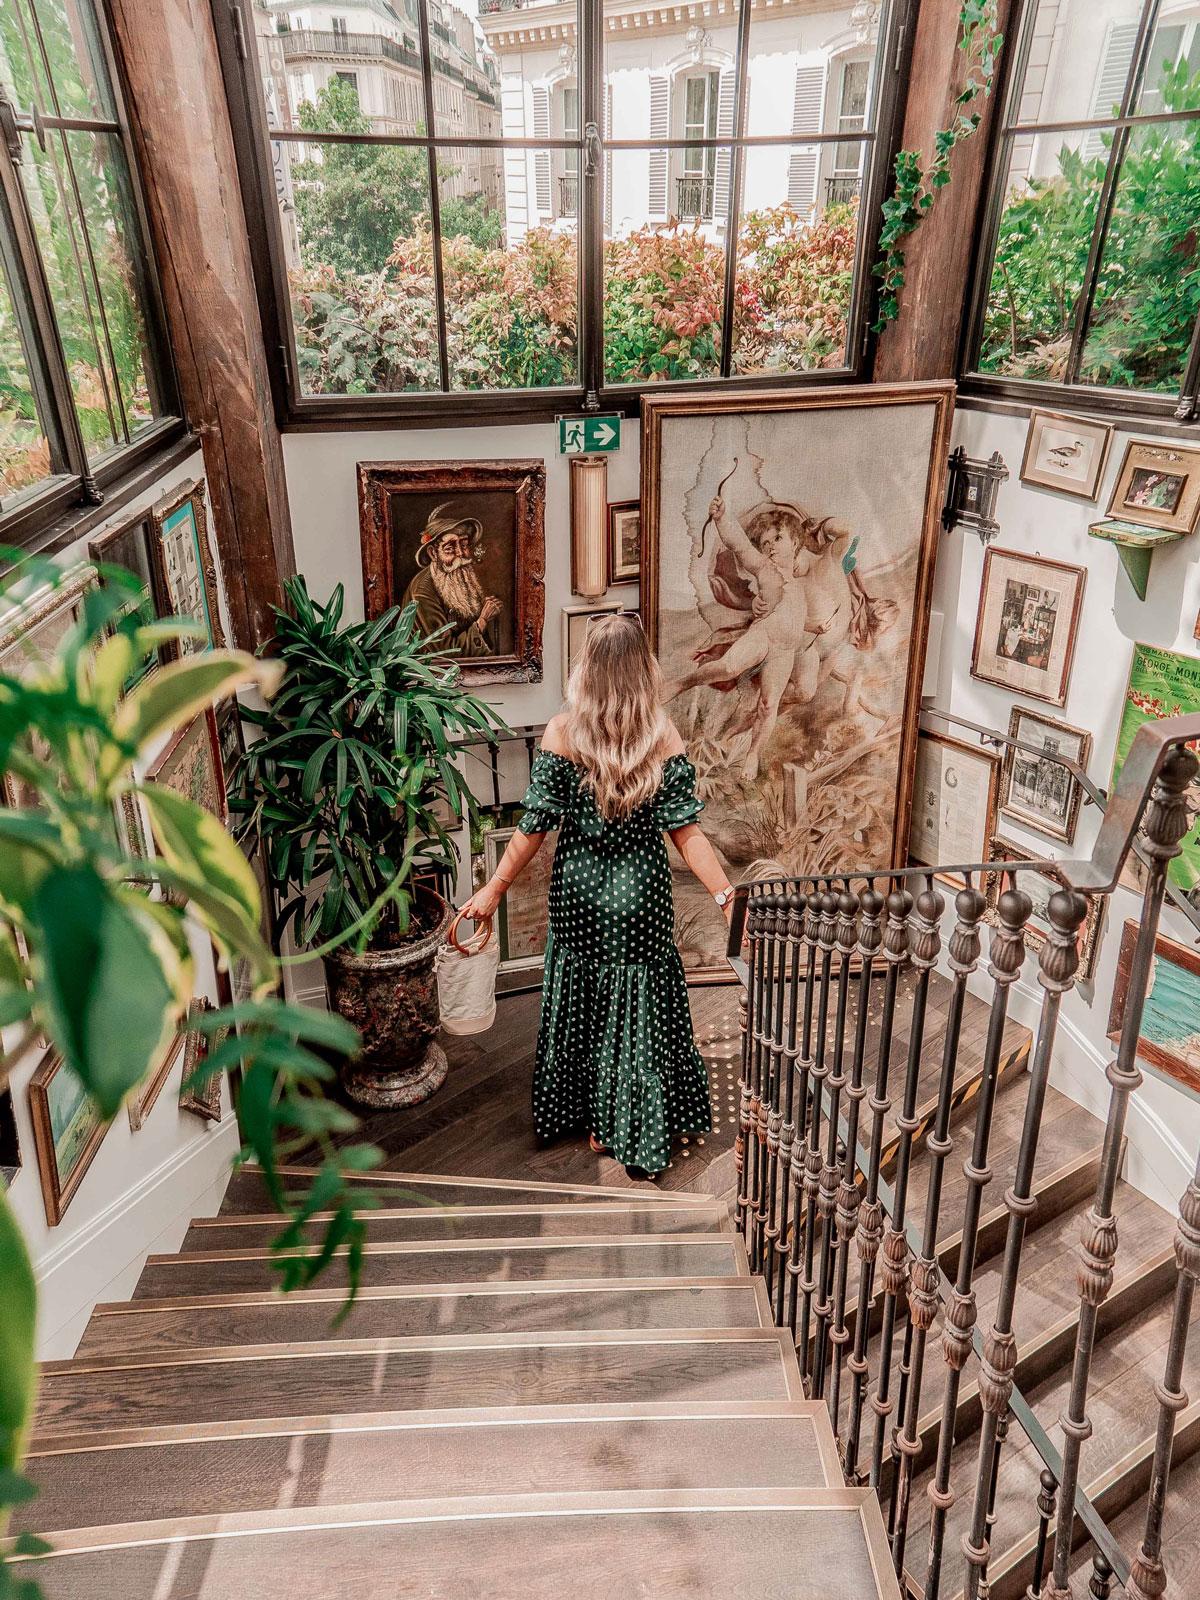 Paris Instagrammable 20 Best Paris Photography Locations Instagram Spots Pink Mamma @kelseyinlondon Kelsey Heinrichs